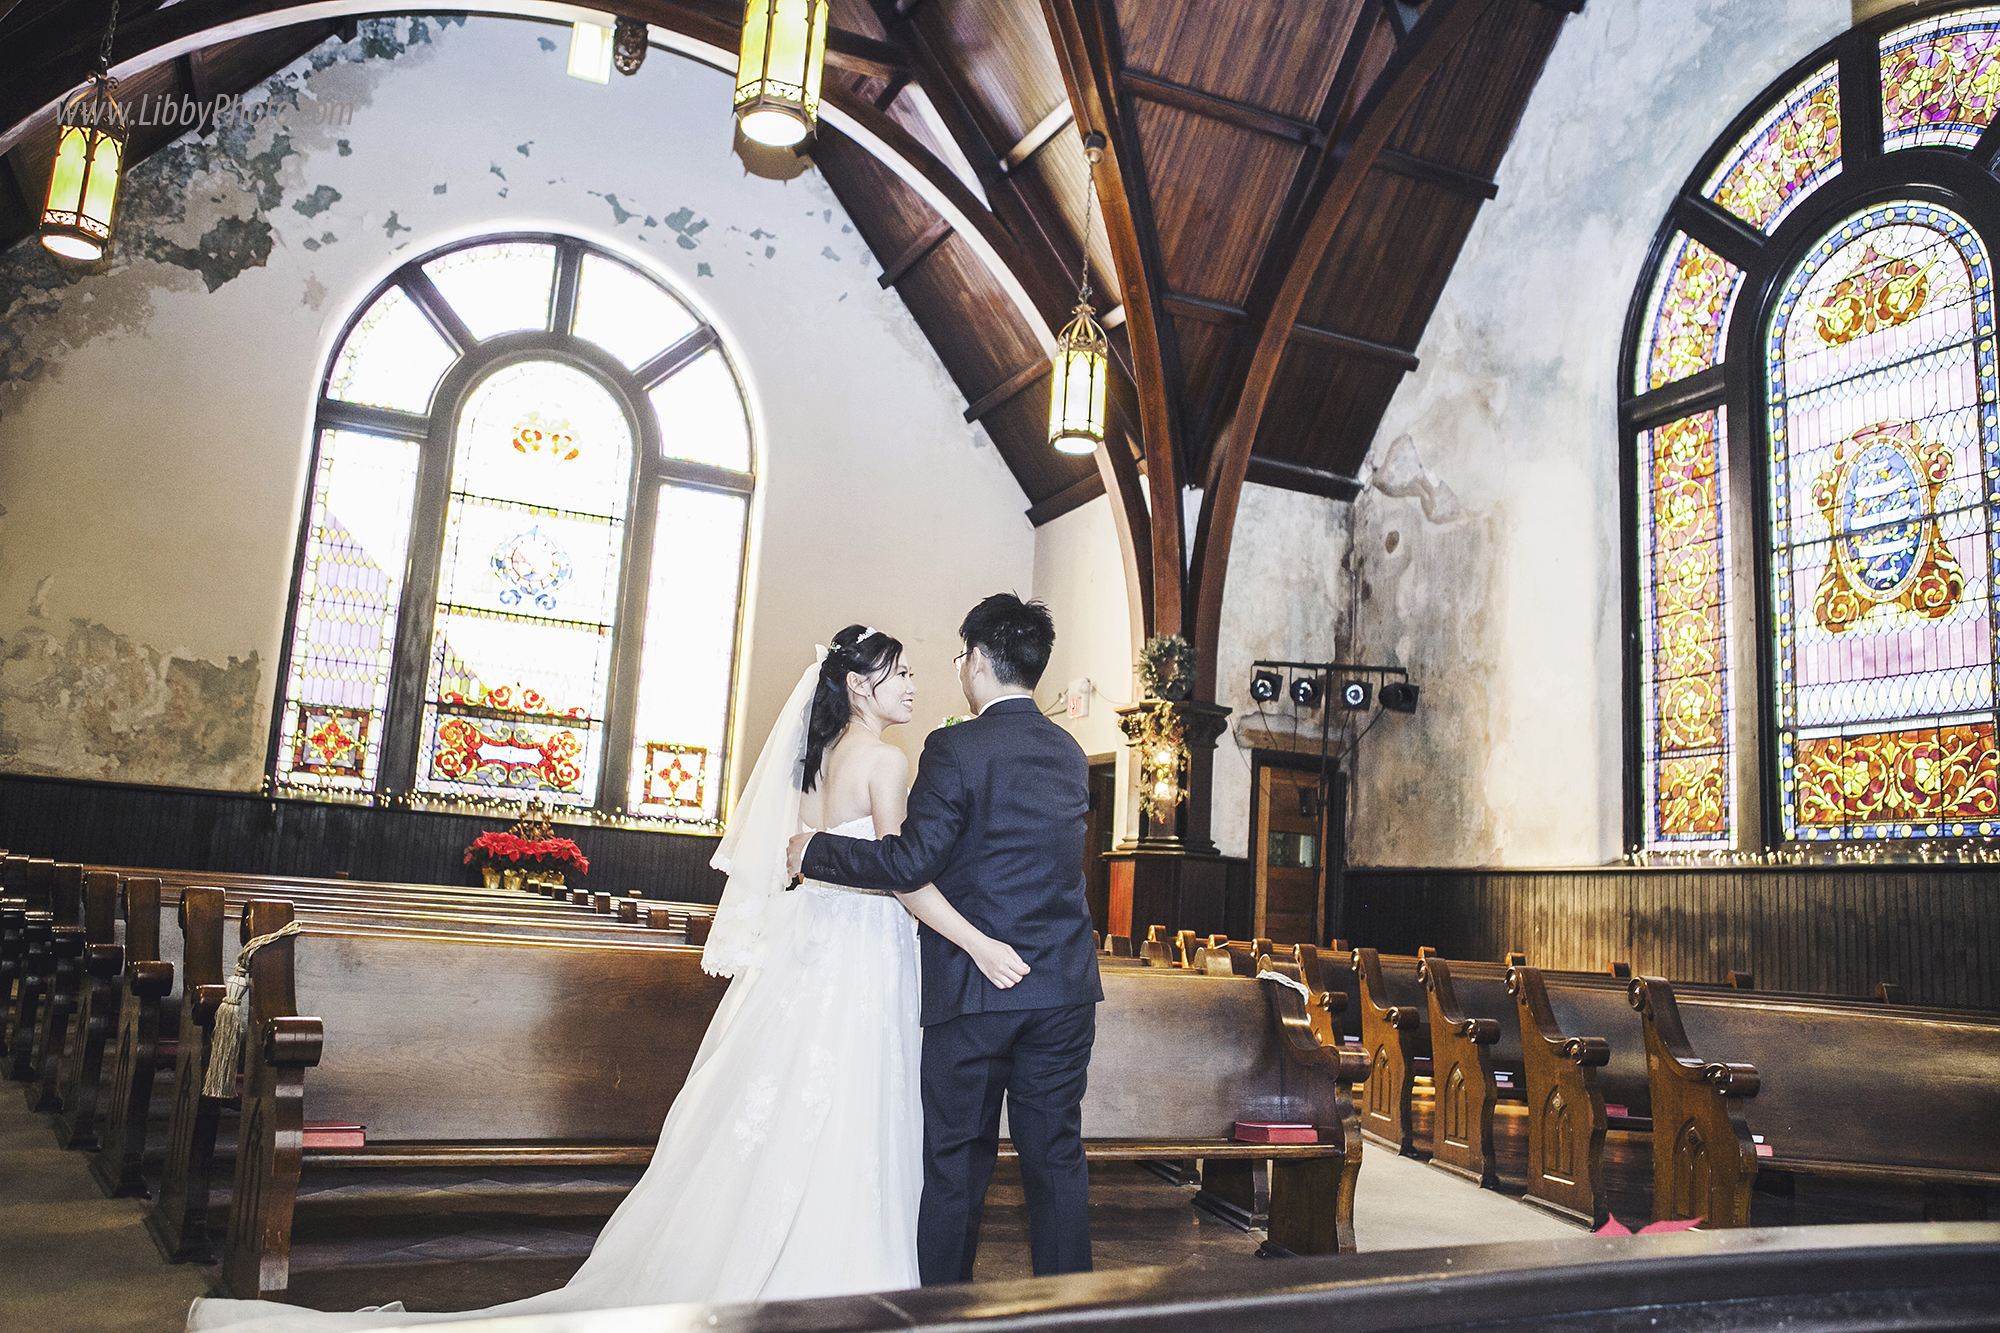 Atlanta wedding photography Libbyphoto (36).jpg